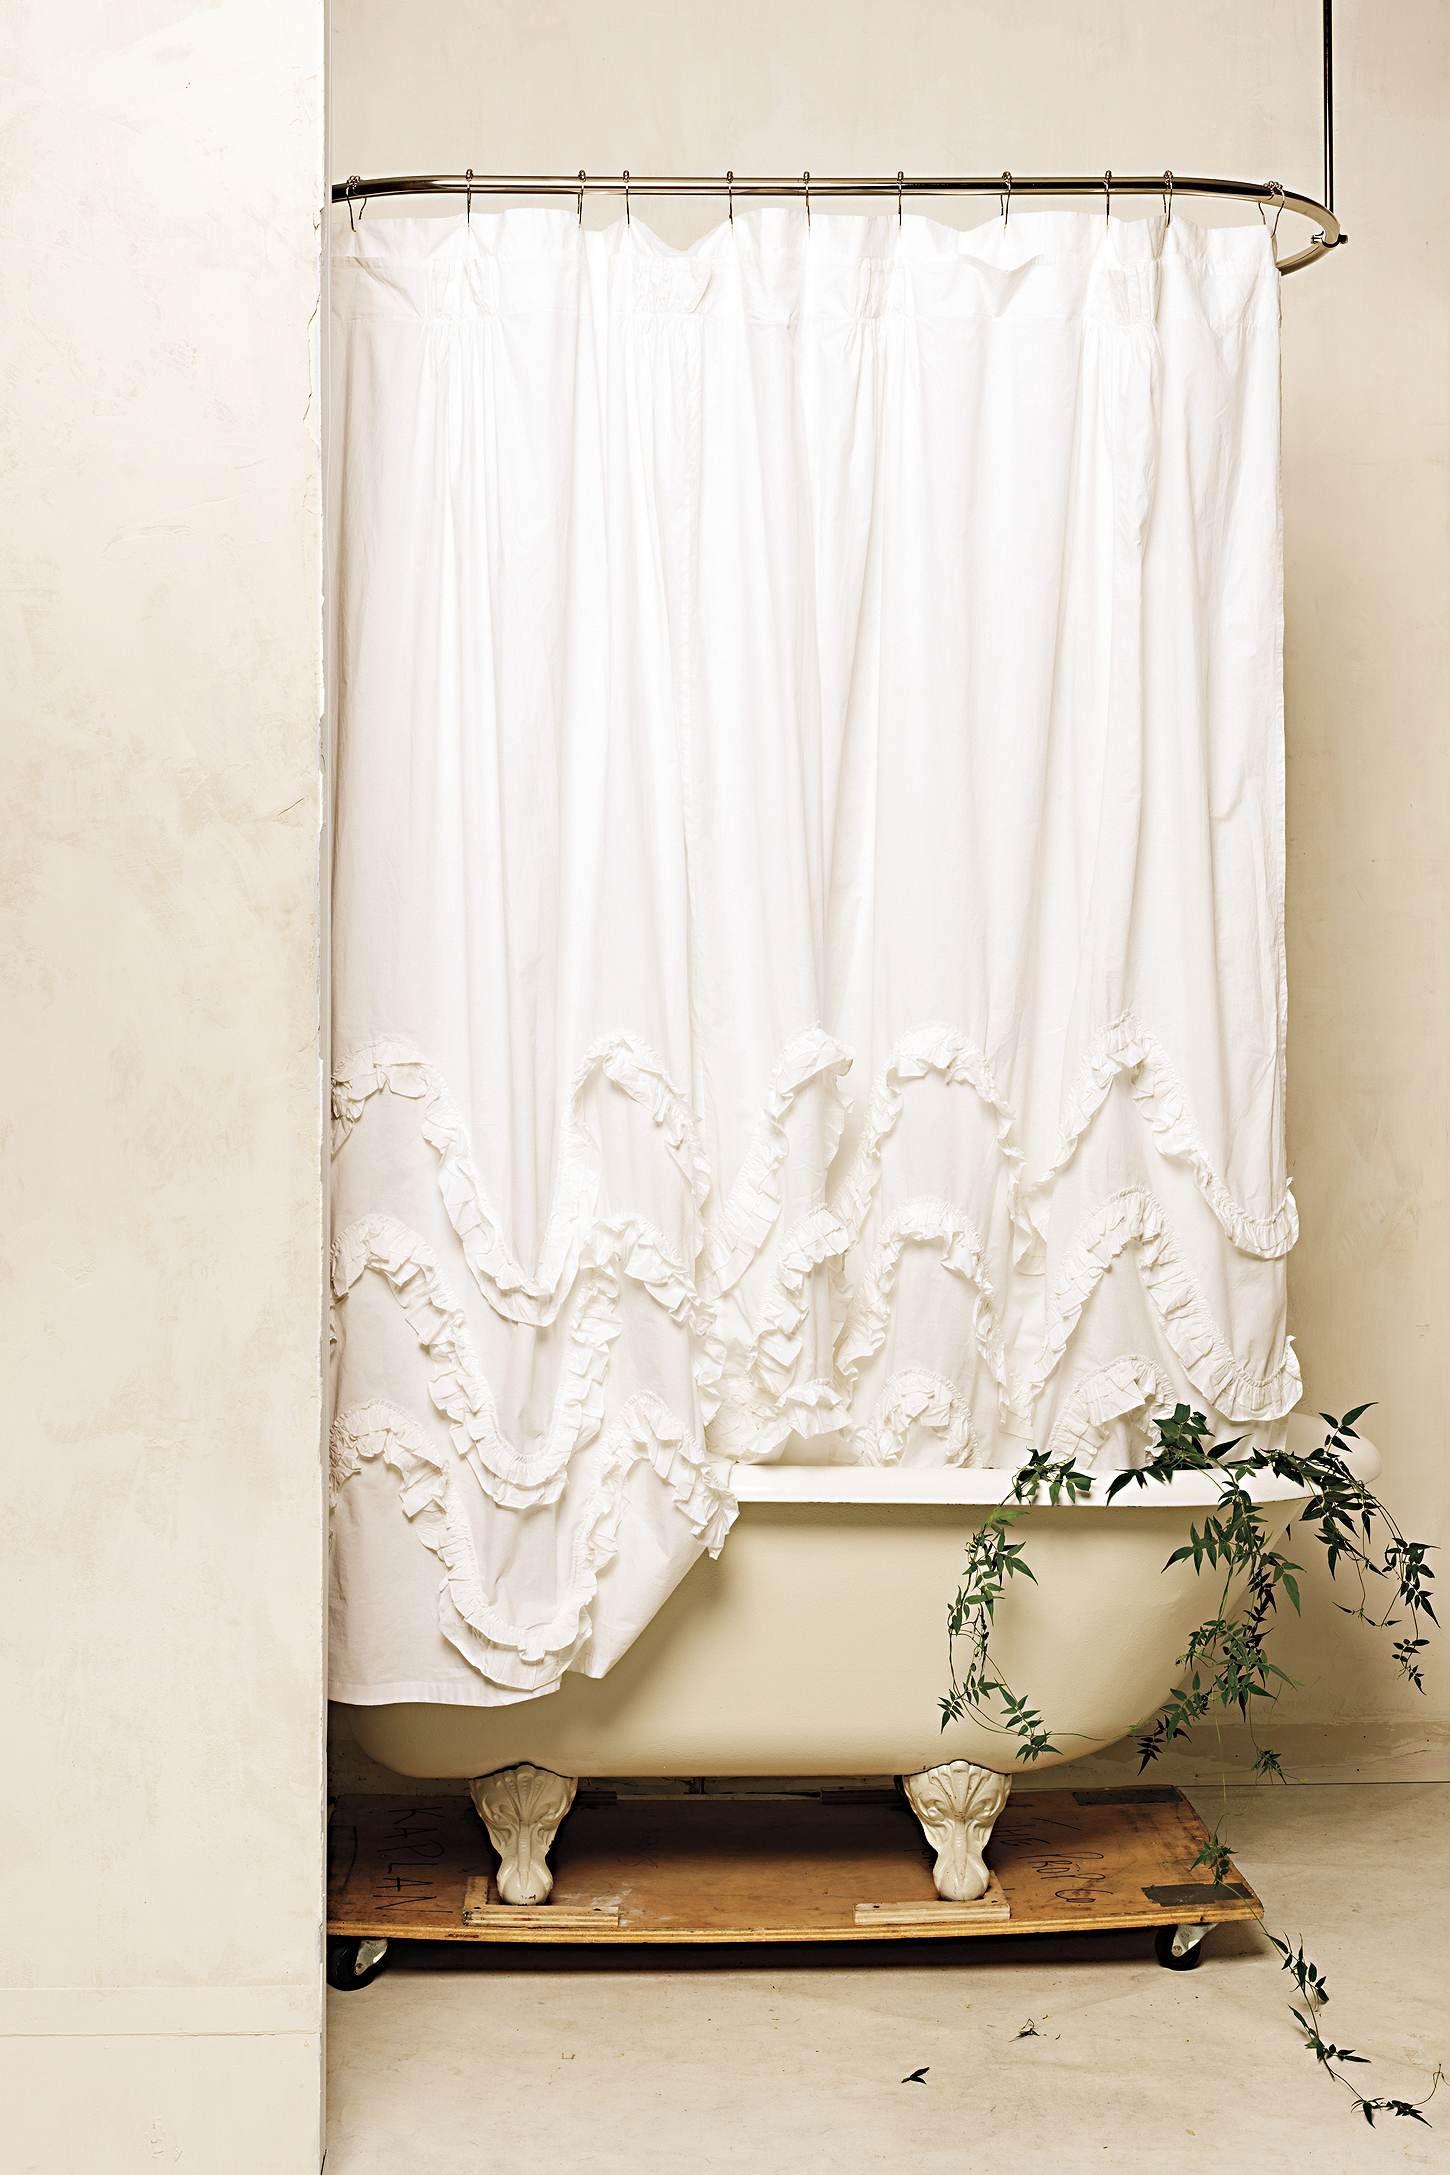 Waves Of Ruffles Shower Curtain Shabby Chic Shower Curtain